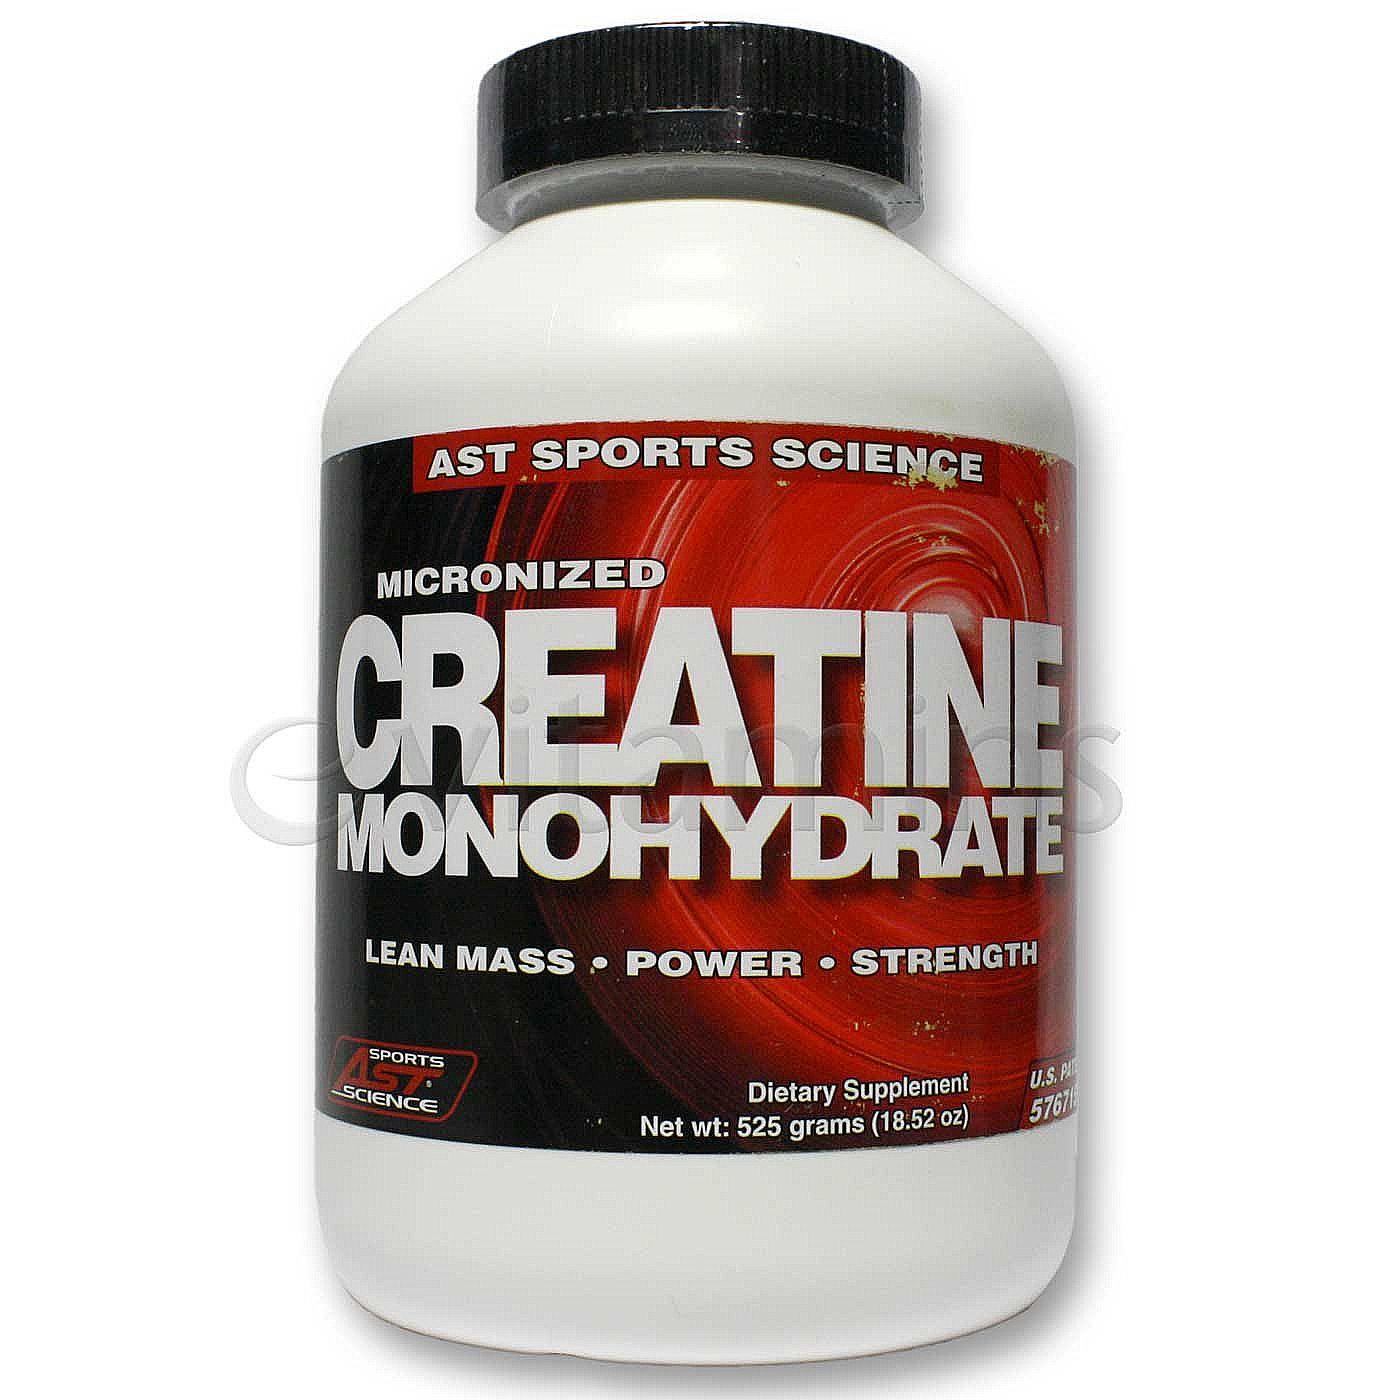 Ast supplements